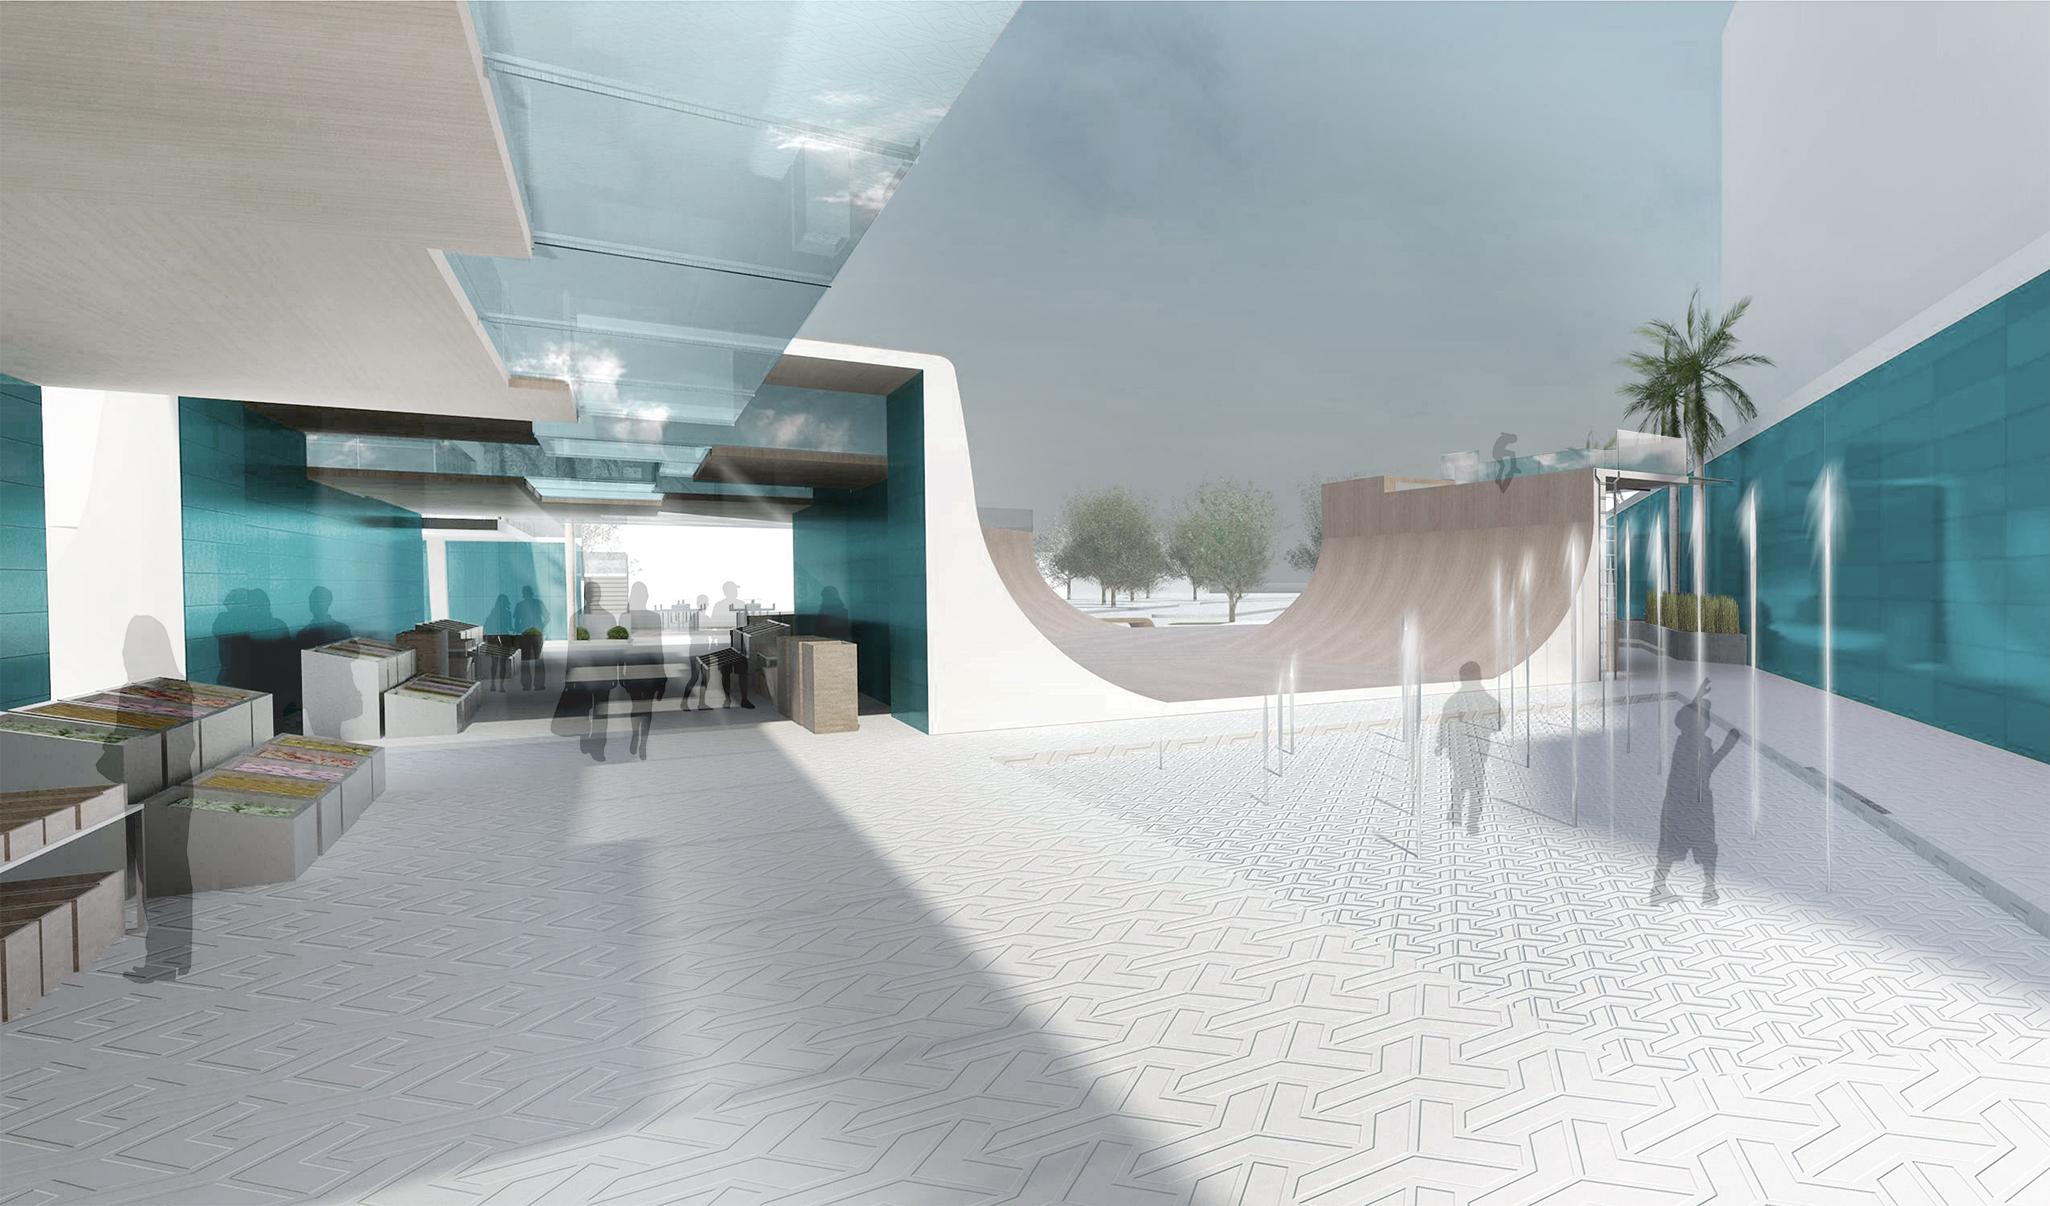 (1/7) Urban Intervention - Graduate Studio